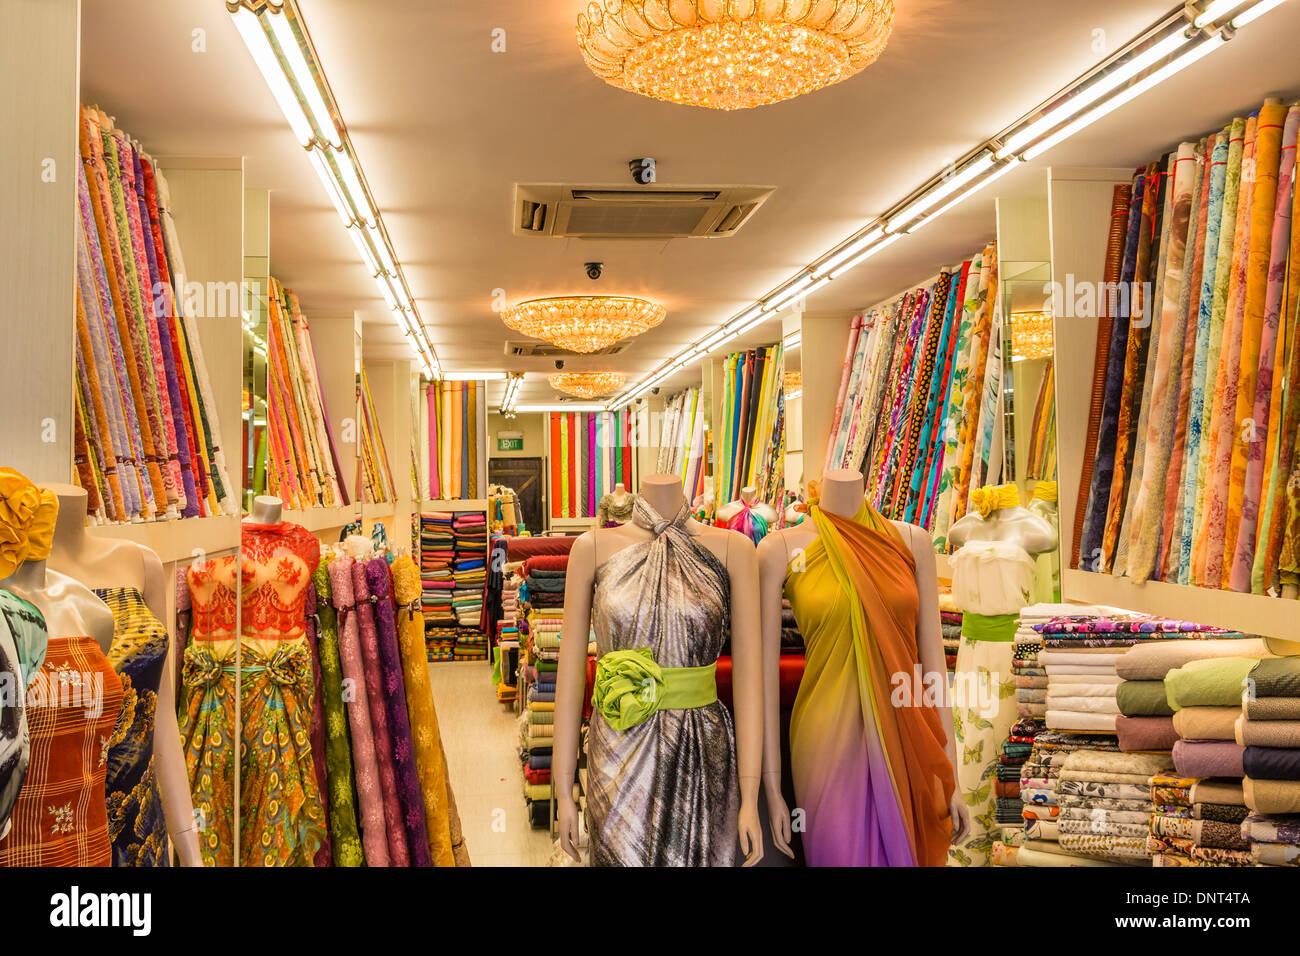 Cloth Shop, Kampong Glam, Singapore - Stock Image